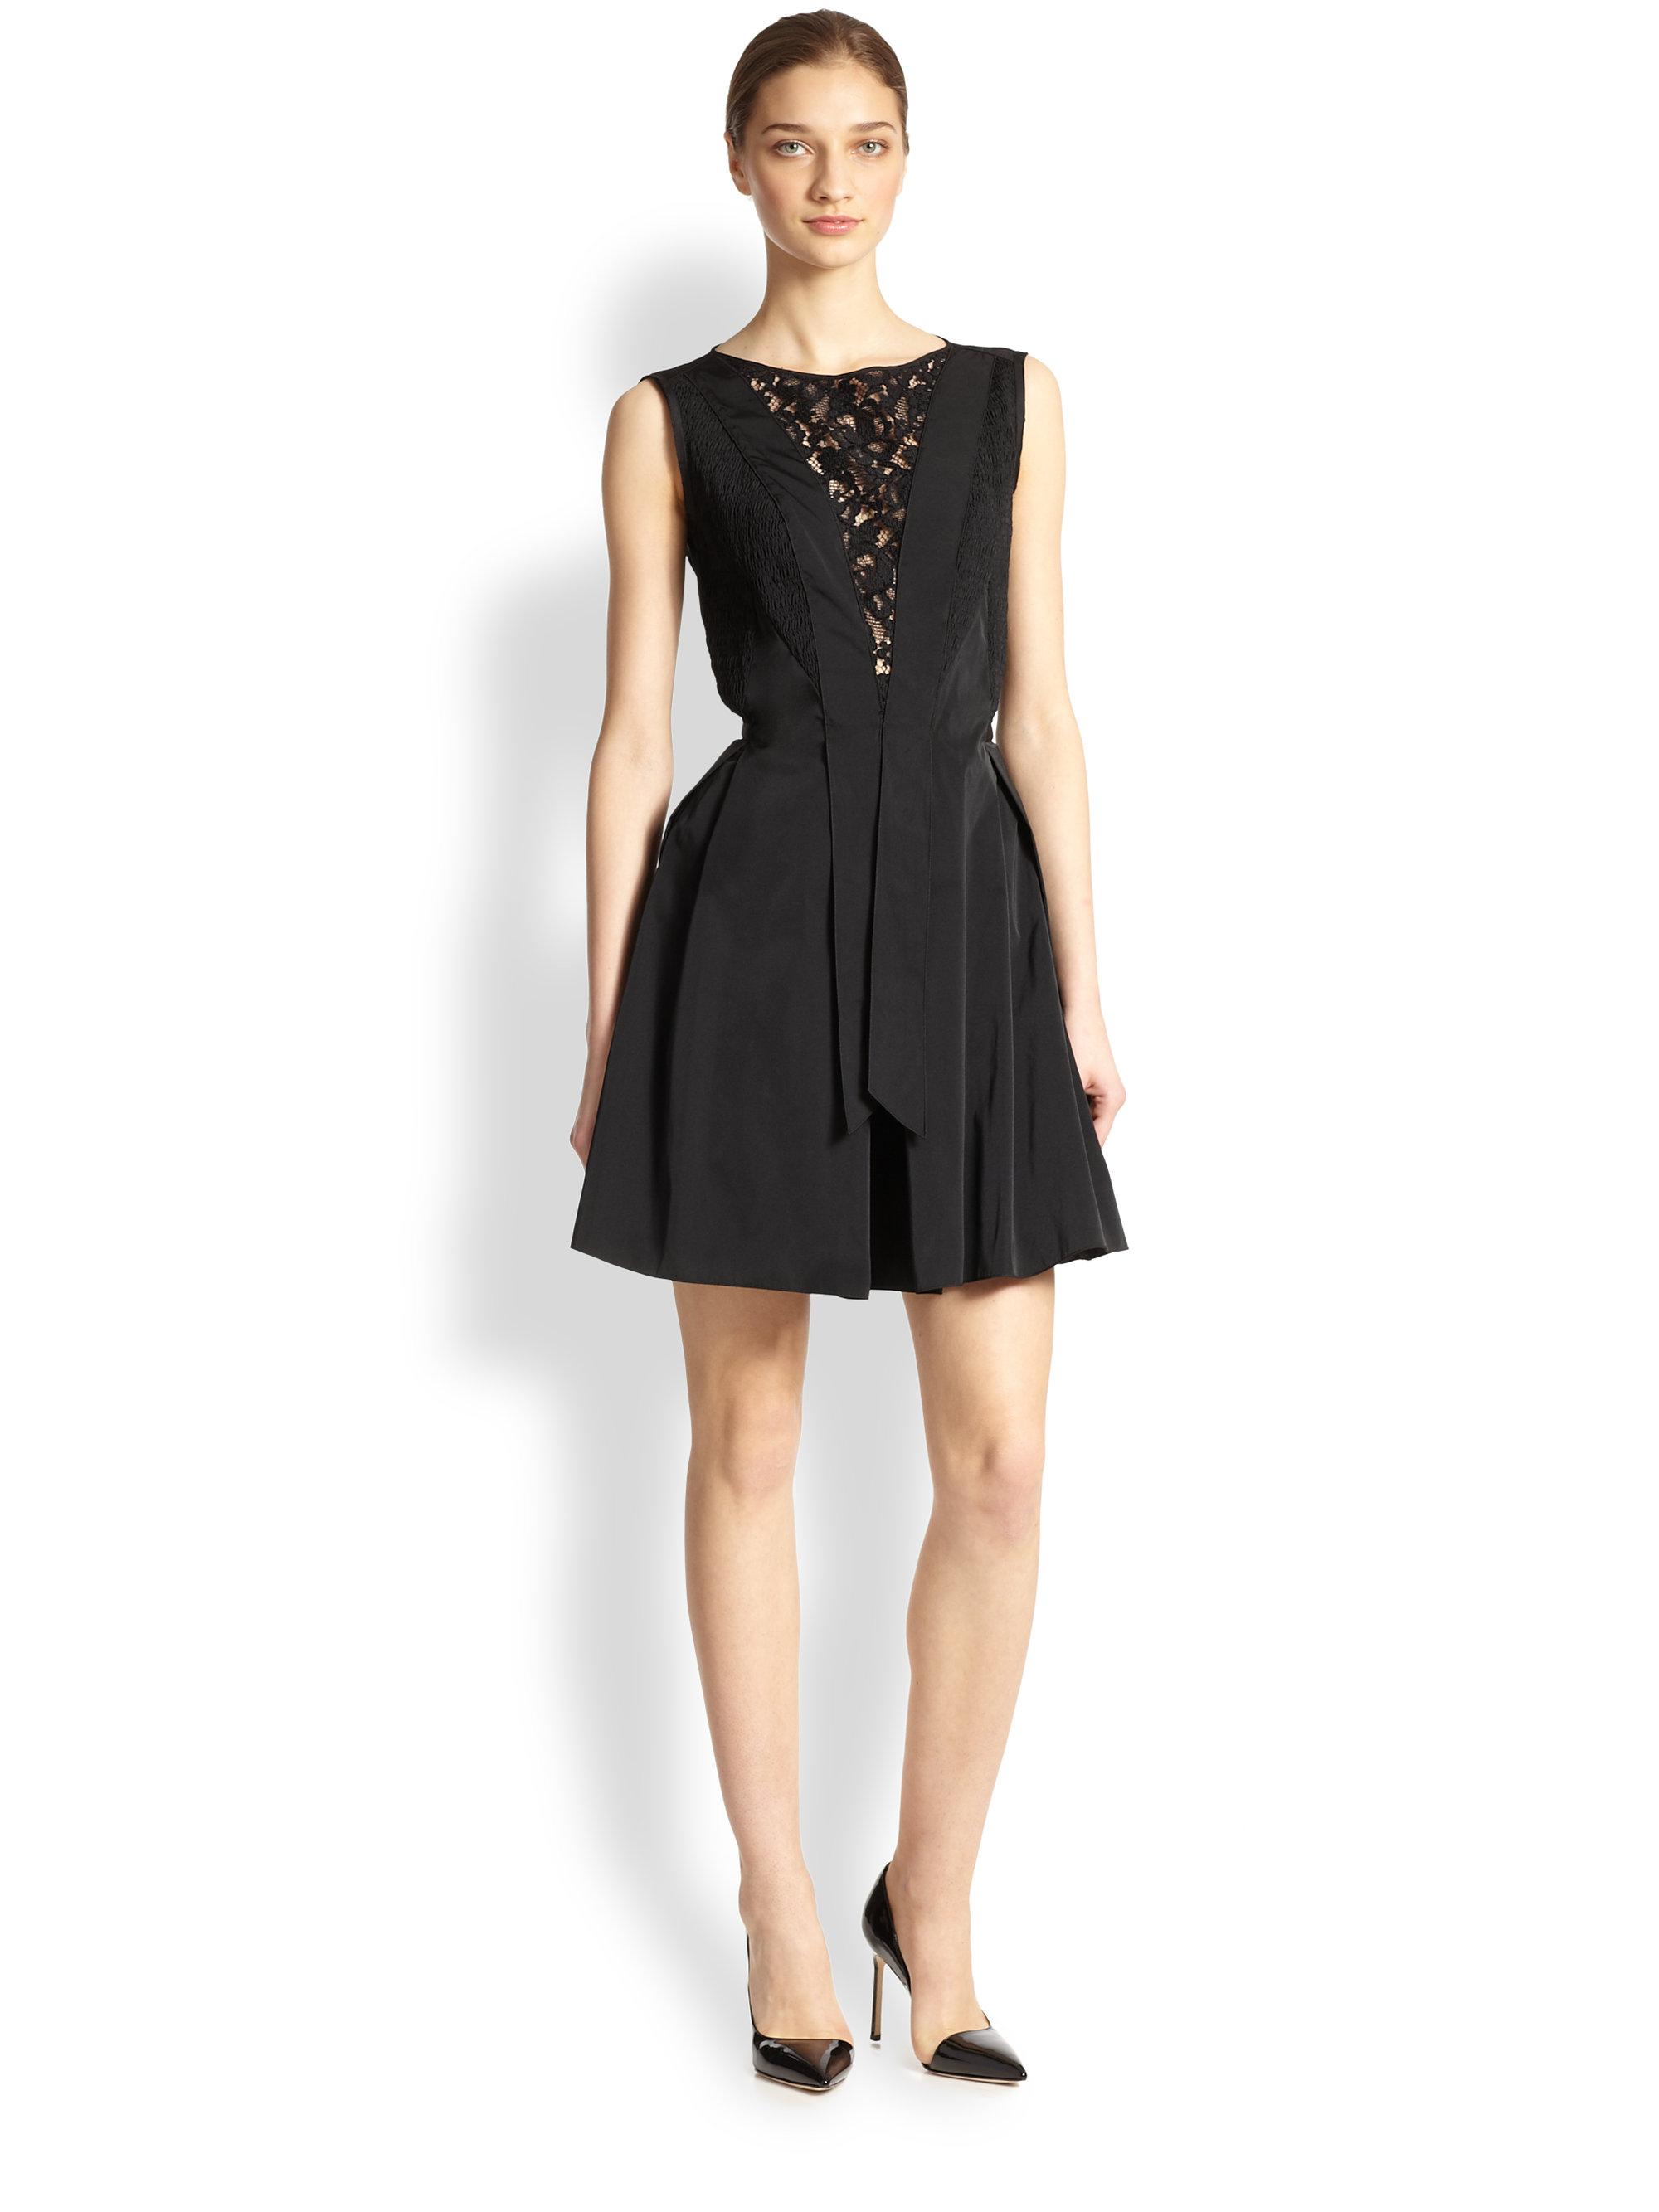 Lyst - Nina Ricci Lace-Inset Short Dress in Black 7819a8286